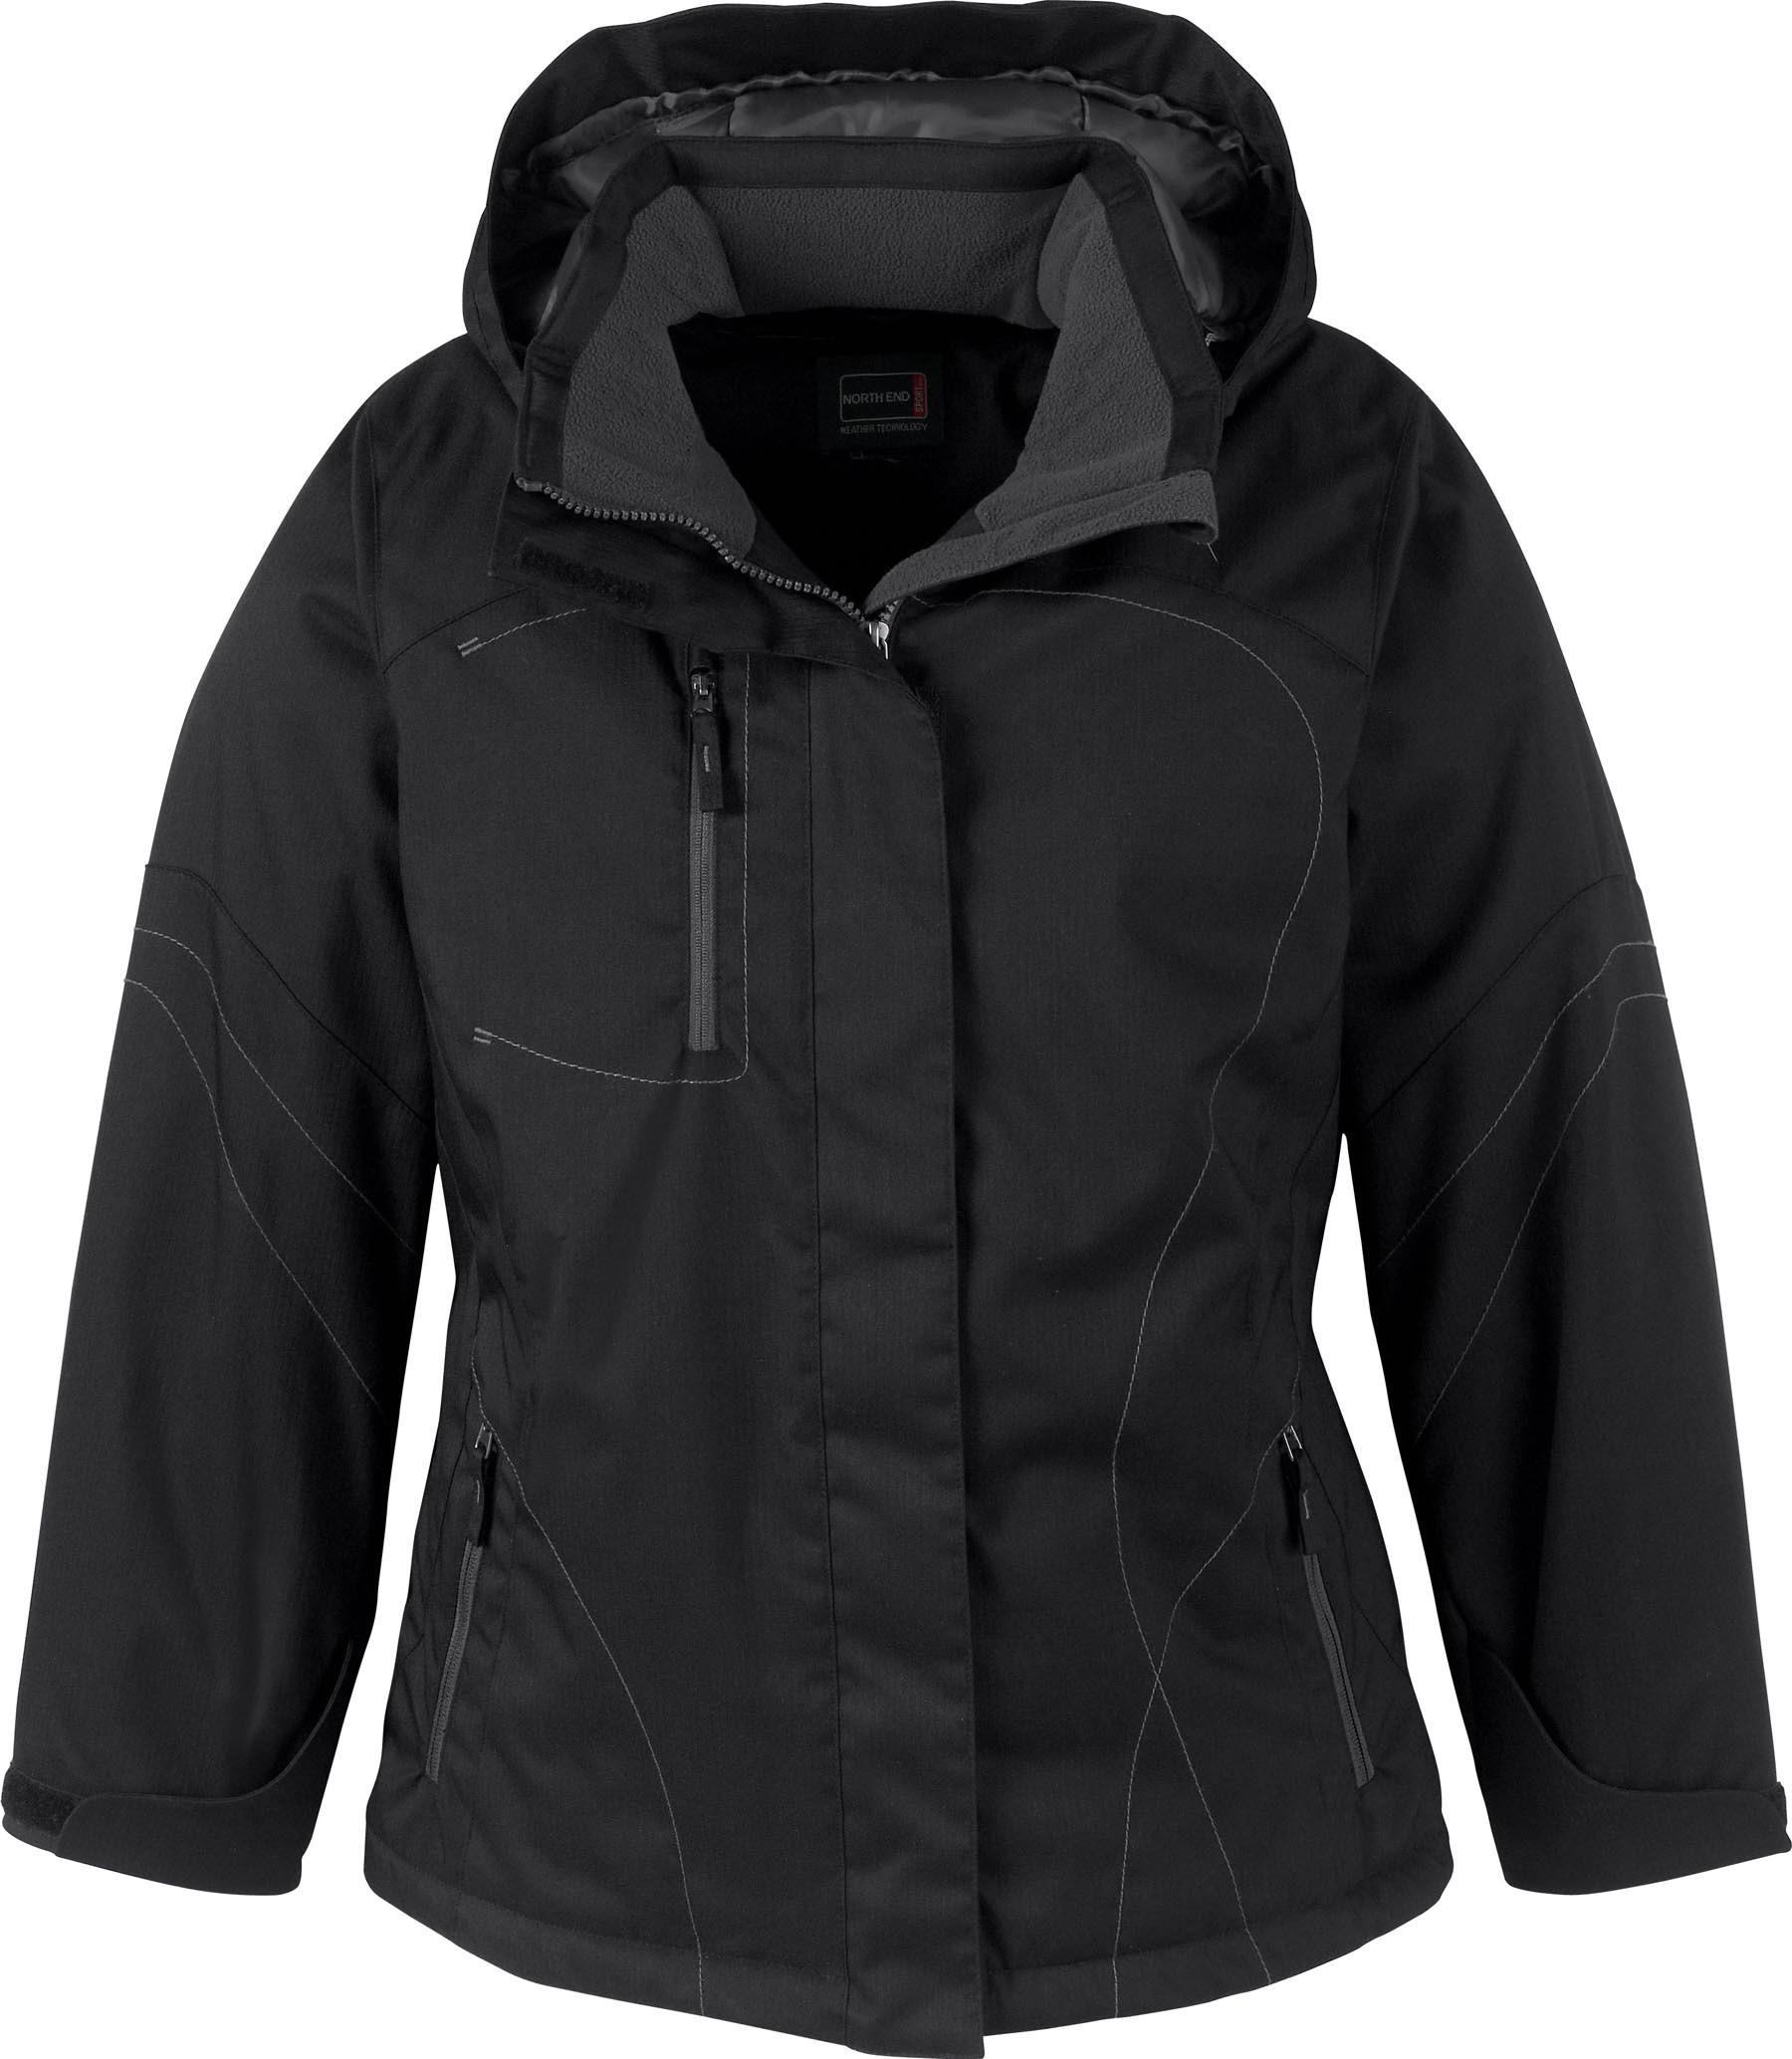 Ash City UTK 3 Warm.Logik 78643 - Traverse Ladies' Two-Tone Textured Insulated Jacket With Hood